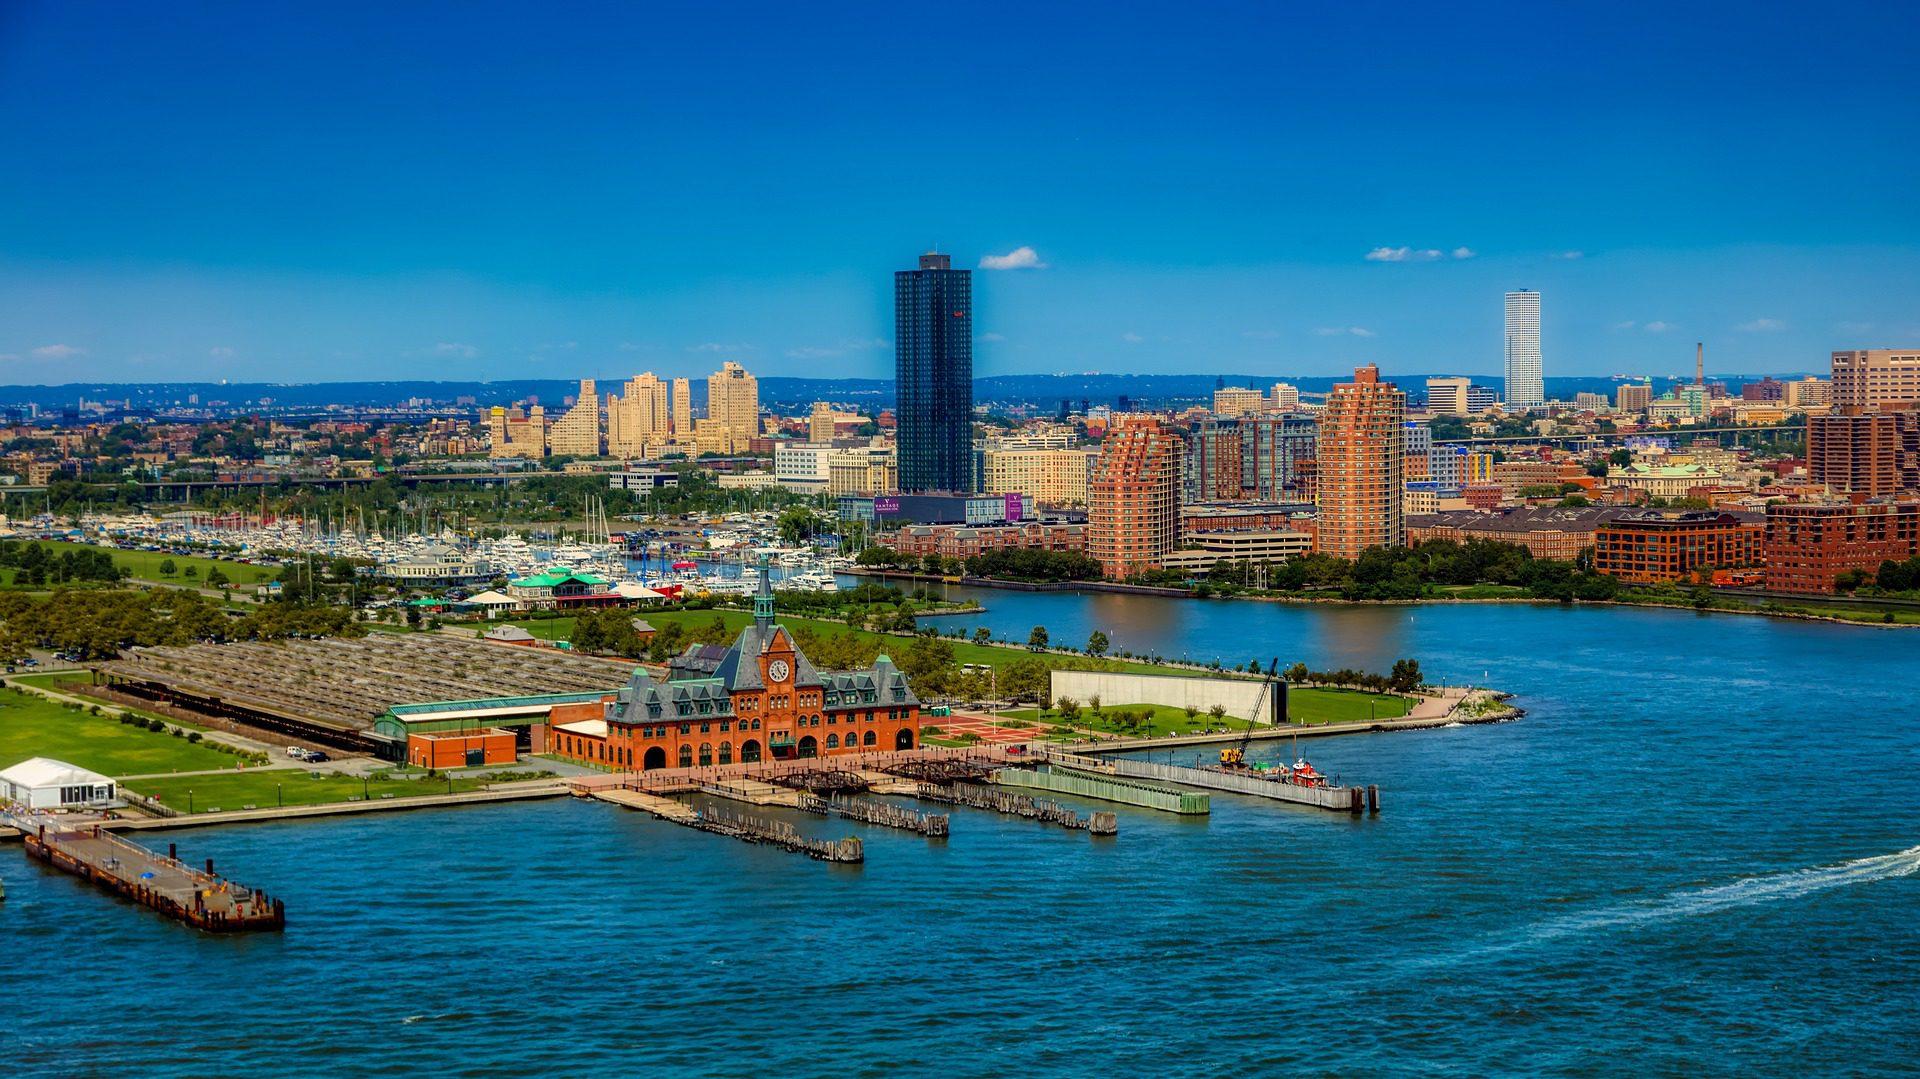 Ellis Island, NY